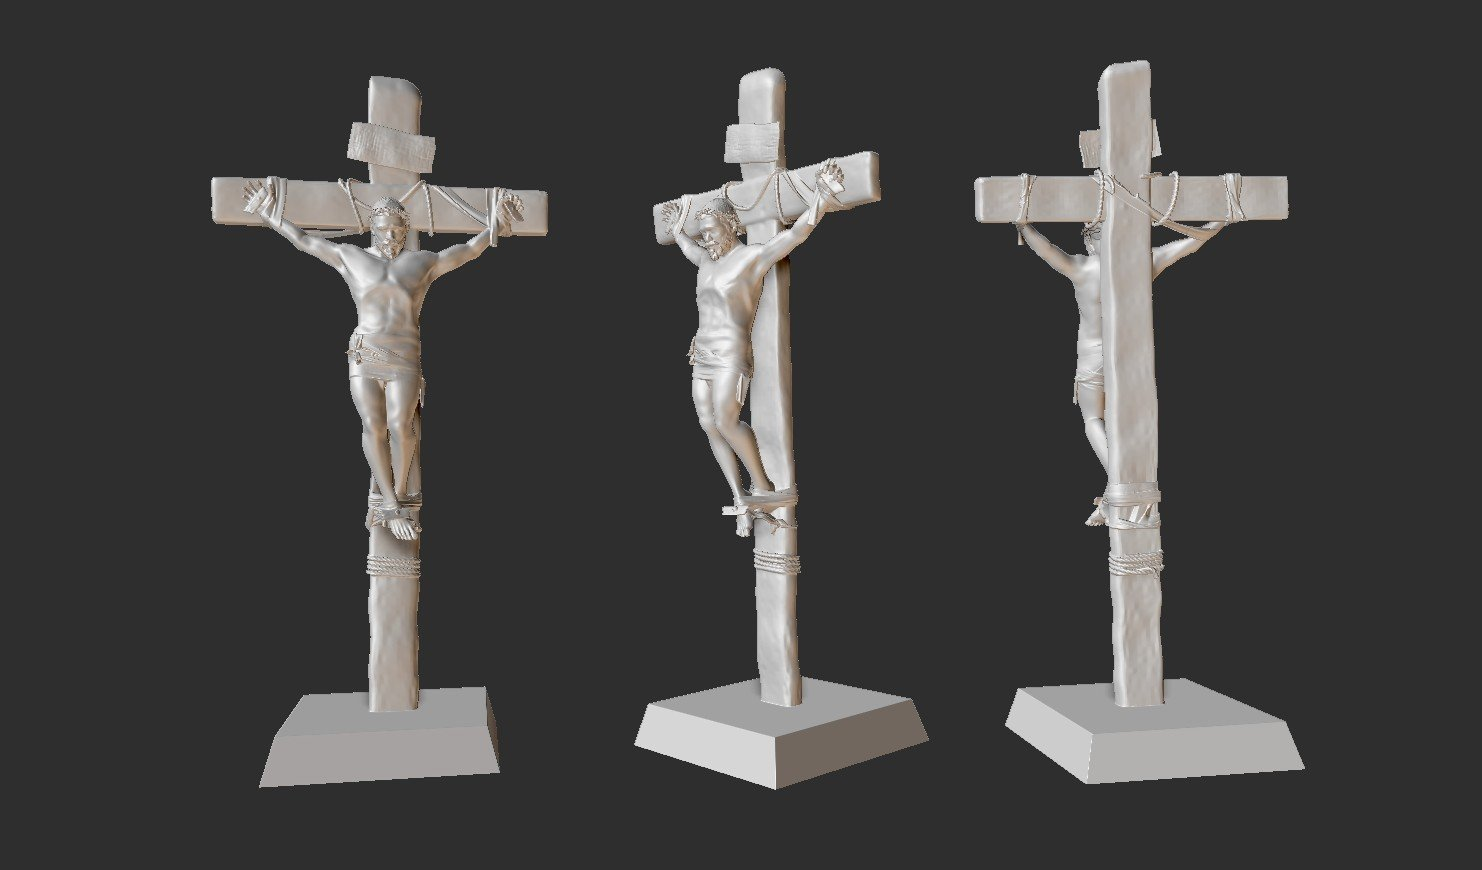 Abenezer Girma - 3D Printing Ready Crucifix